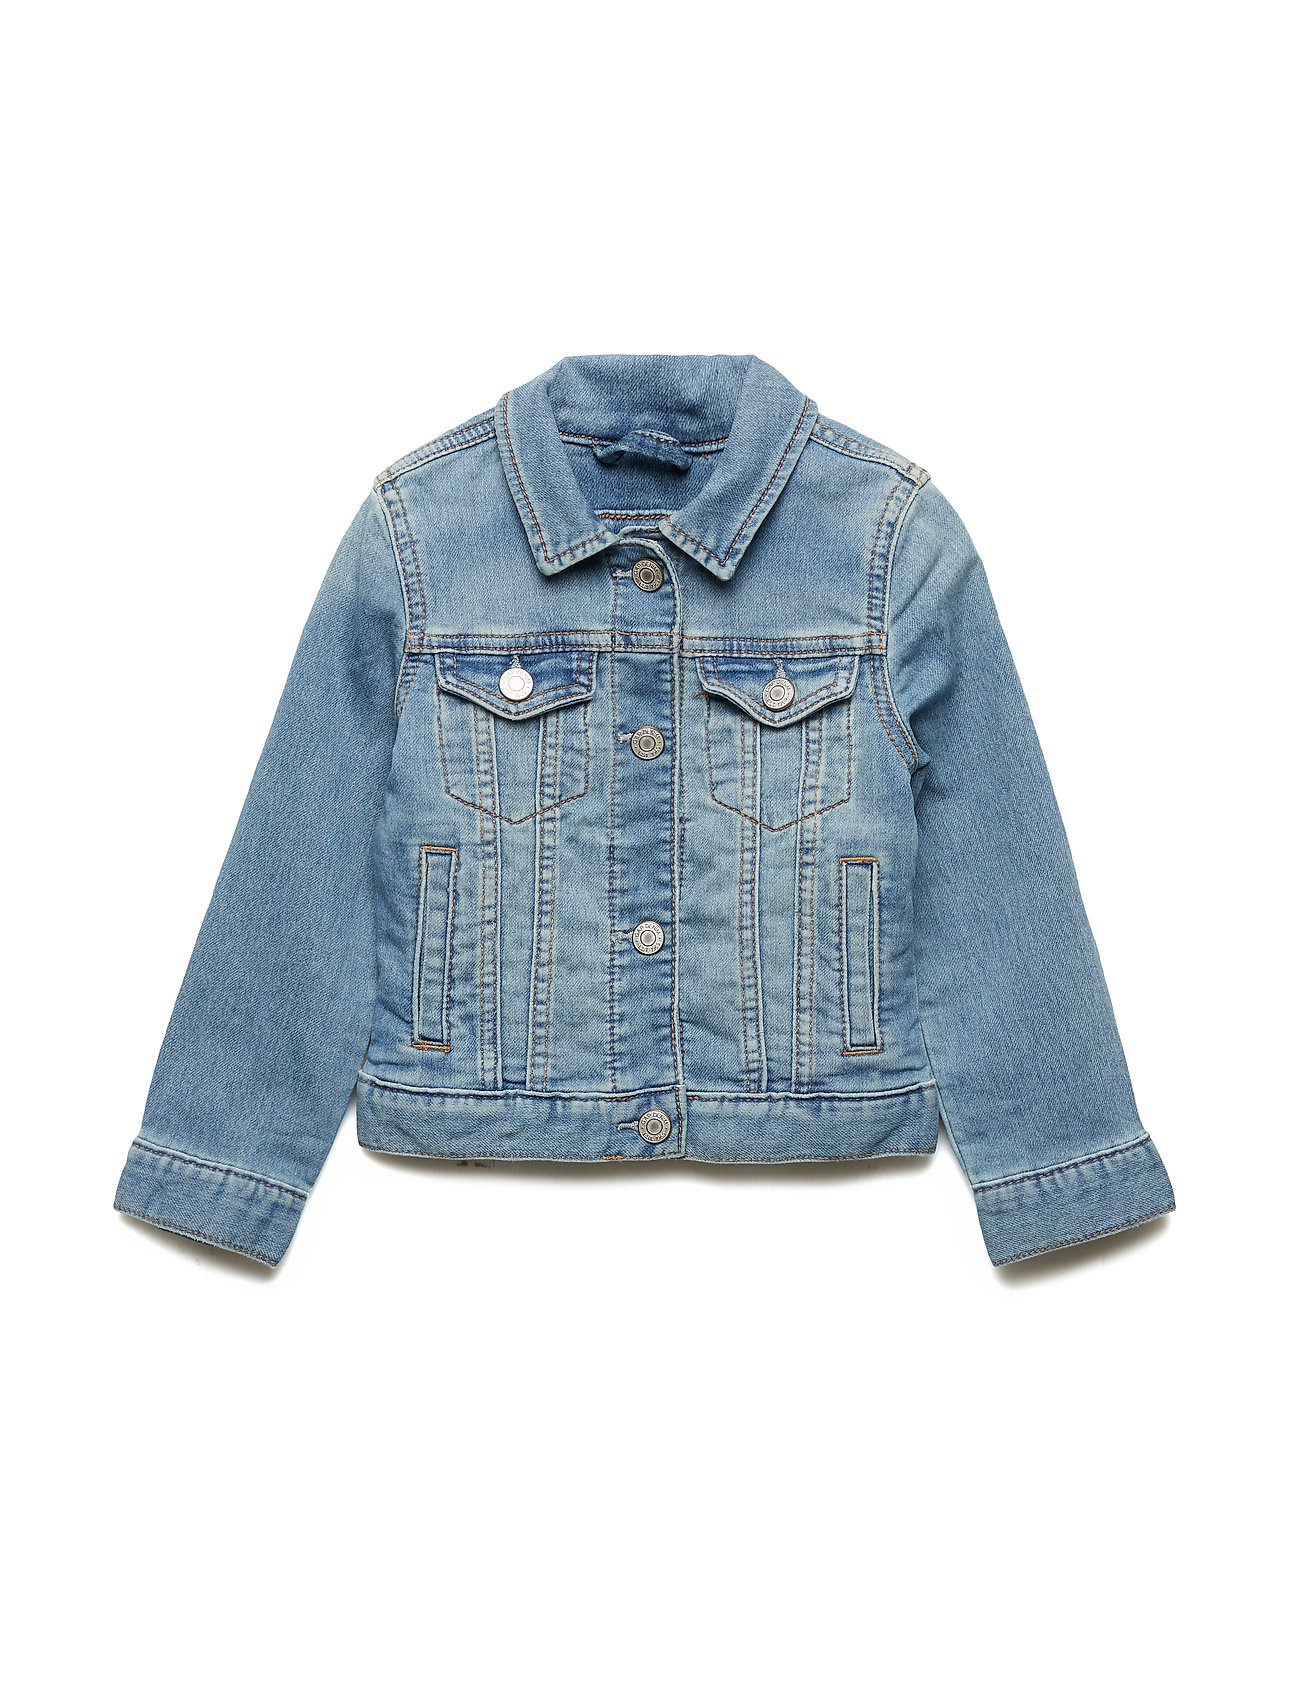 GAP Kids Icon Denim Jacket - LIGHT INDIGO 1